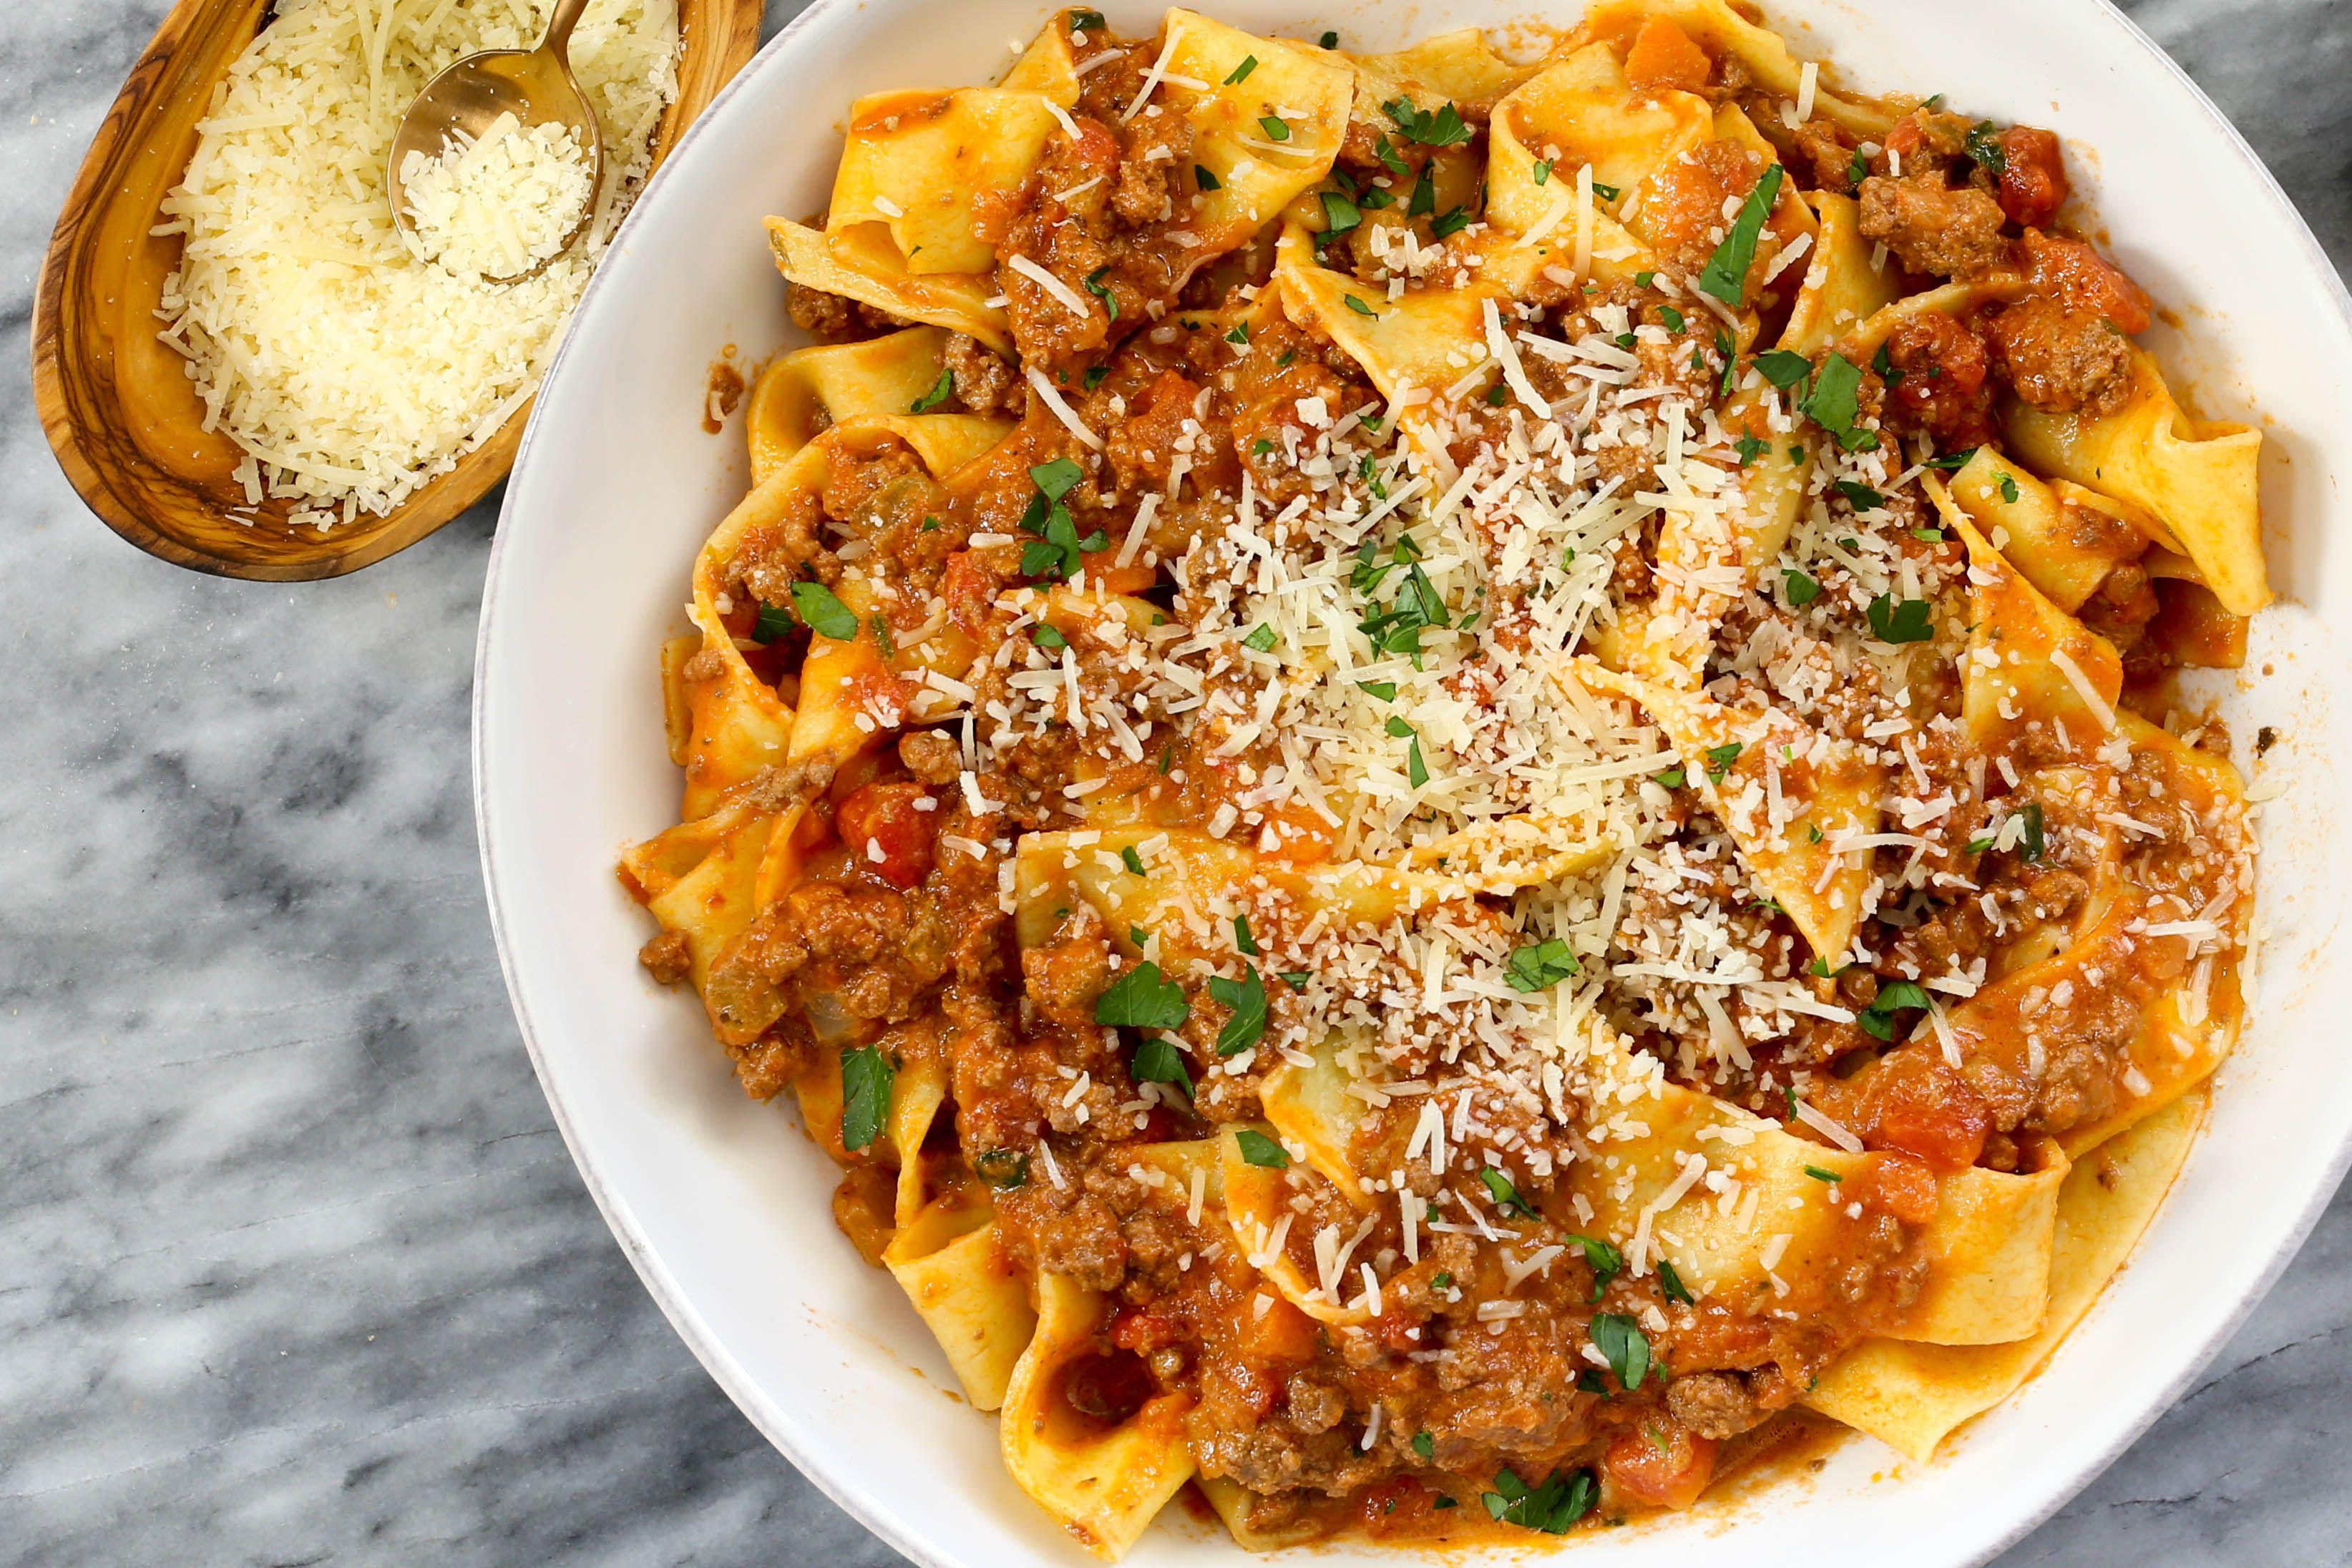 Ragu alla Bolognese with pappardelle pasta